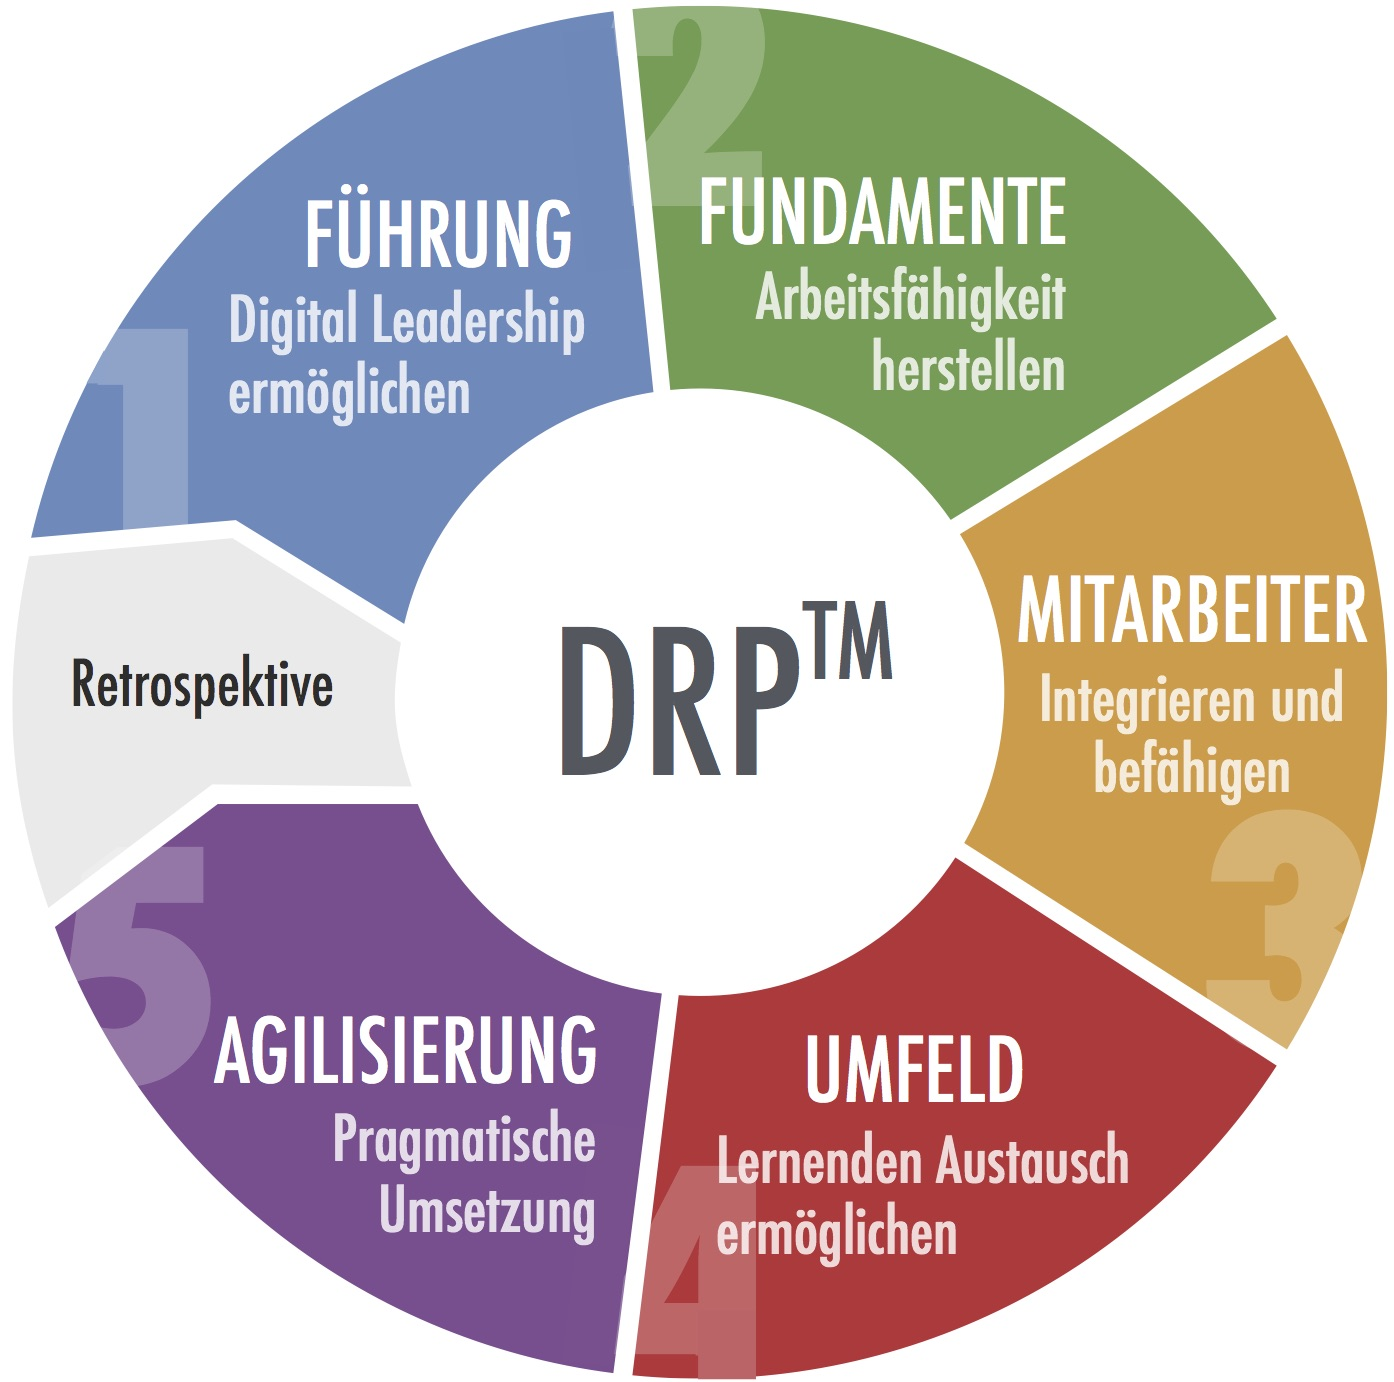 2016-08-12 DRP 1.1 Kreis.jpg